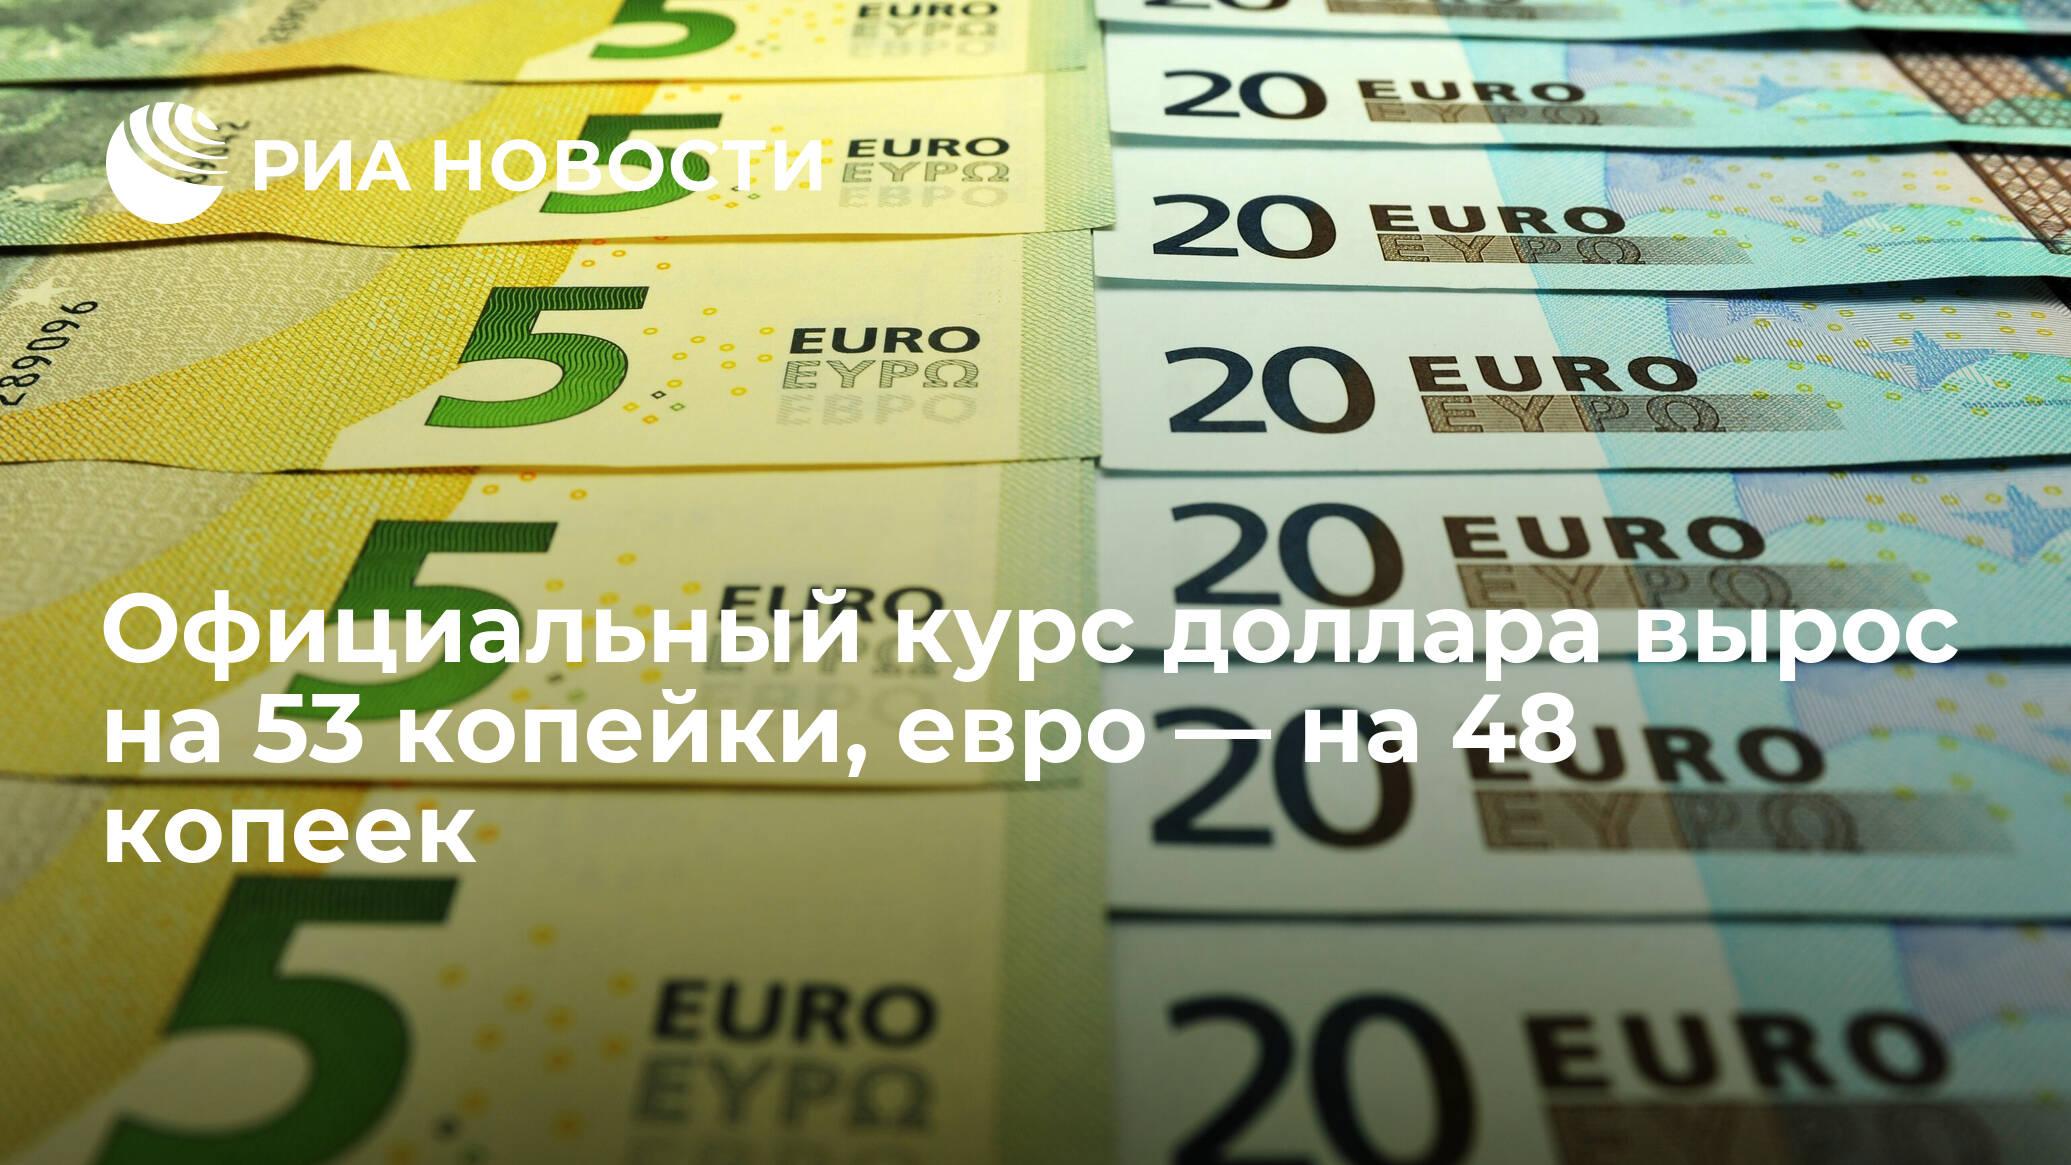 московский кредит банк курс доллара сегодня тинькофф банк онлайн заявка